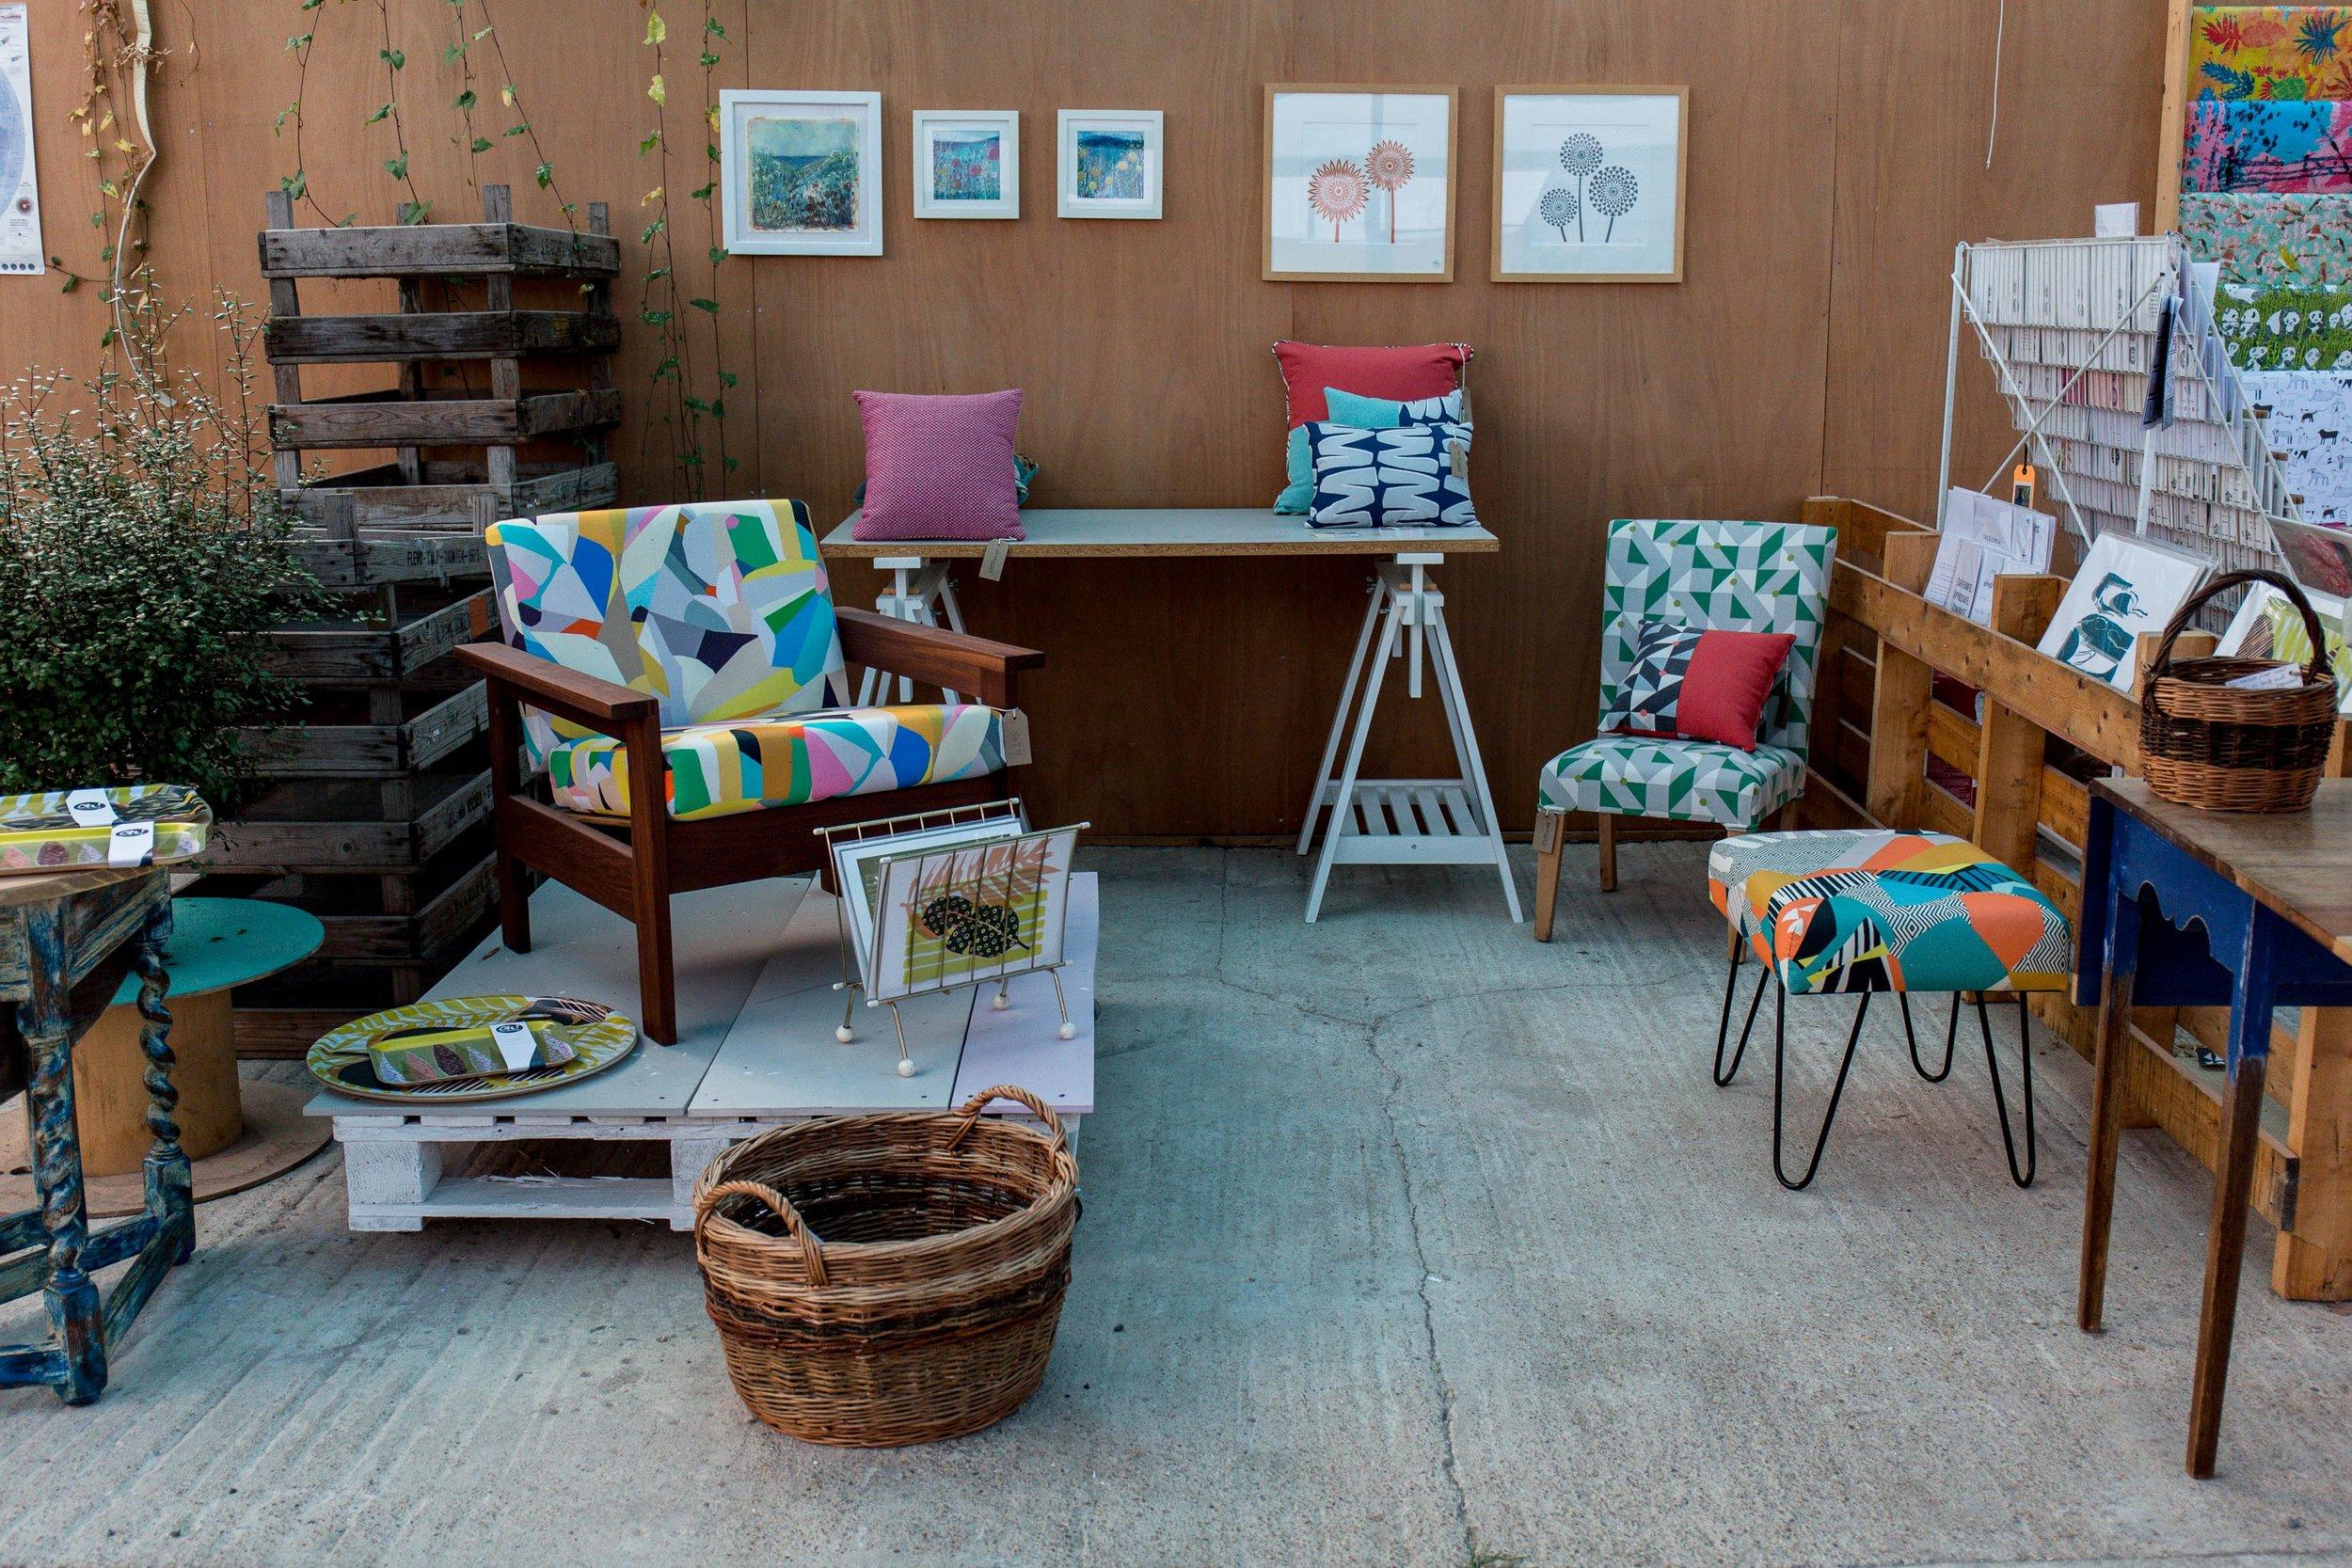 Sussex-mother-retail-artist-booth.jpg